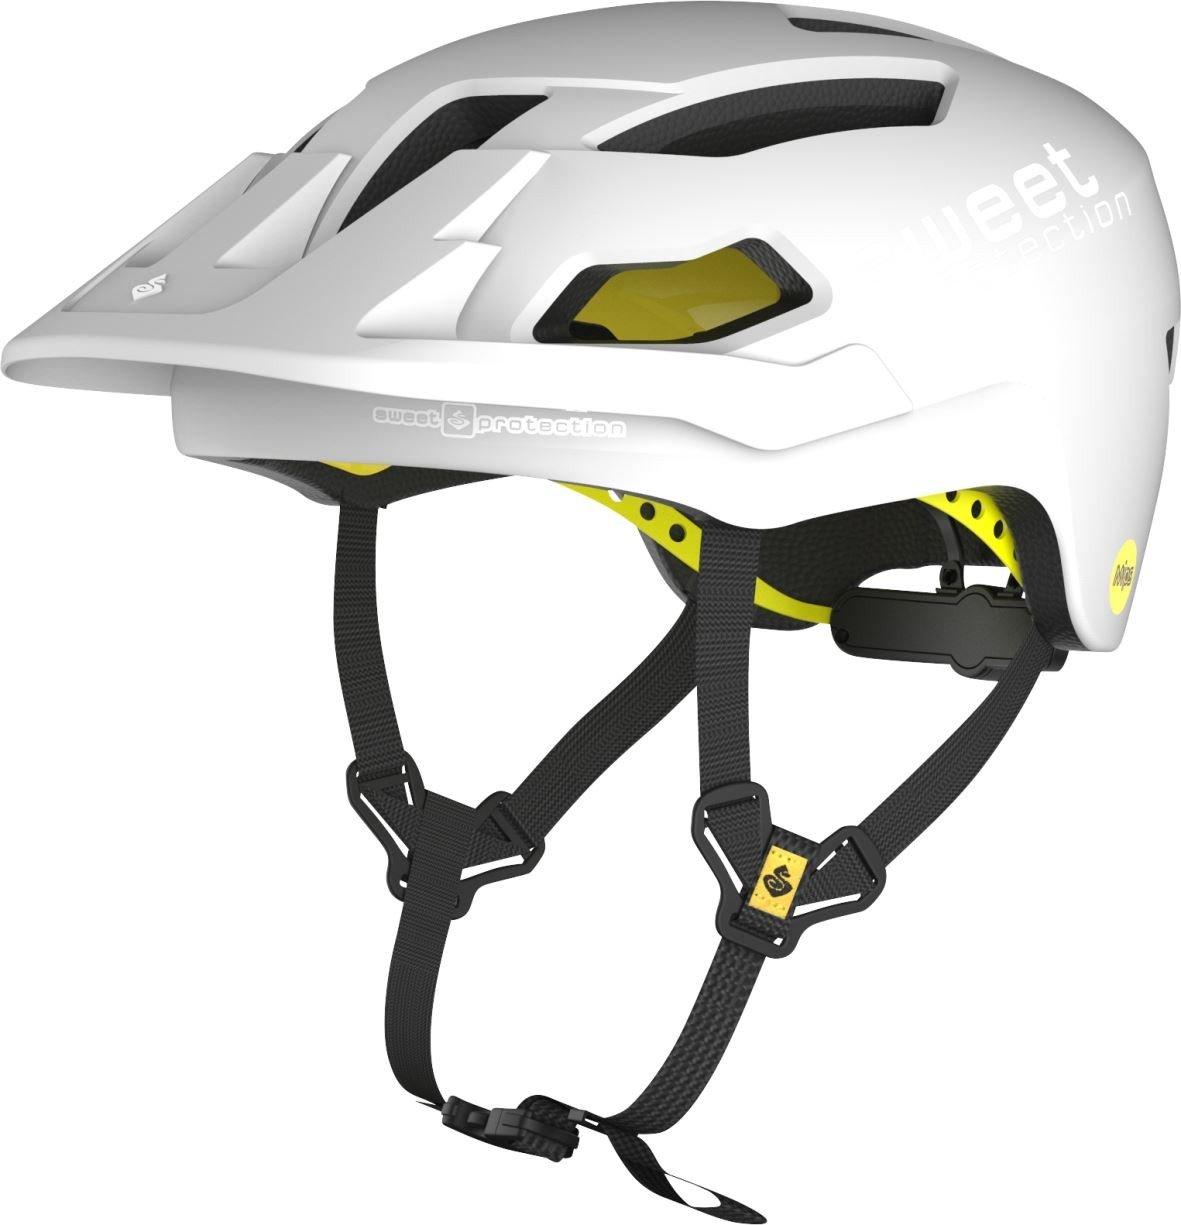 Sweet Protection Dissenter MIPS Bike Helmet-MatteWhit-M/L